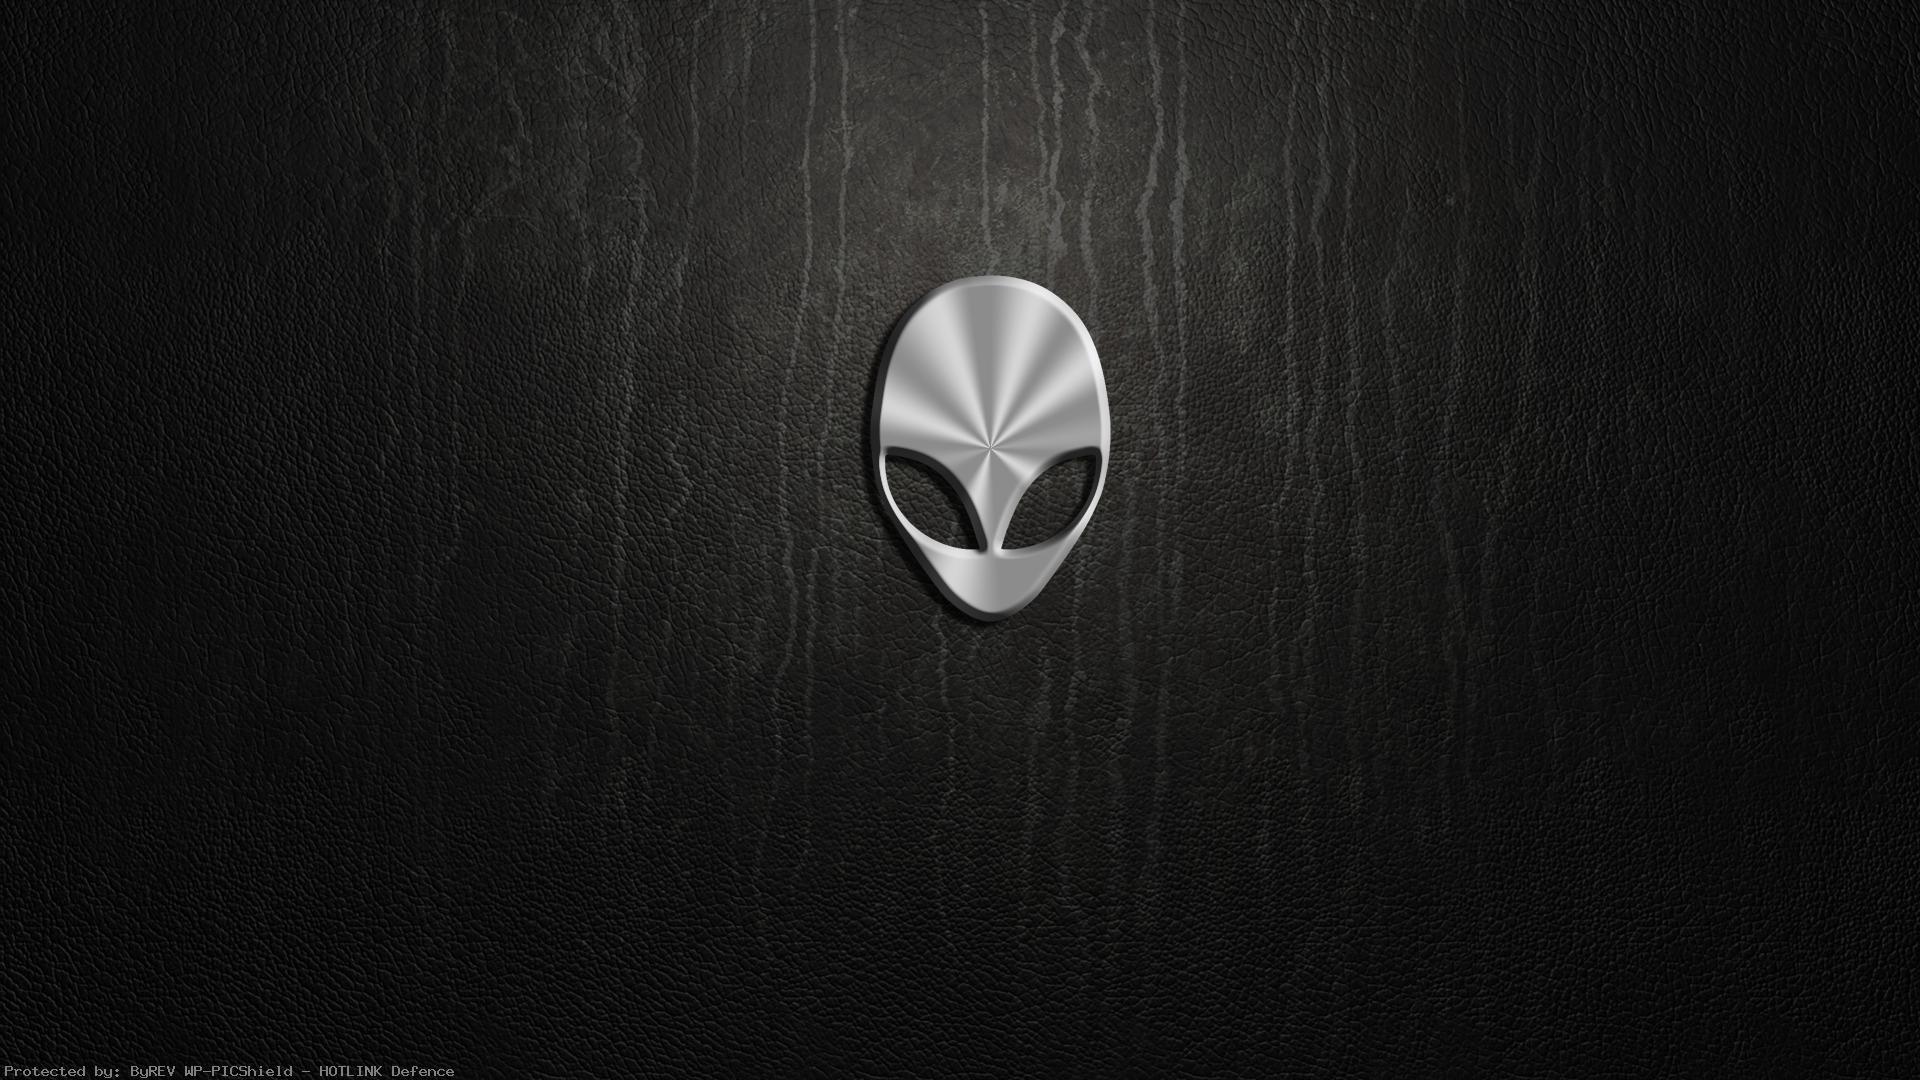 hd-alienware-wallpaper-wp8007625